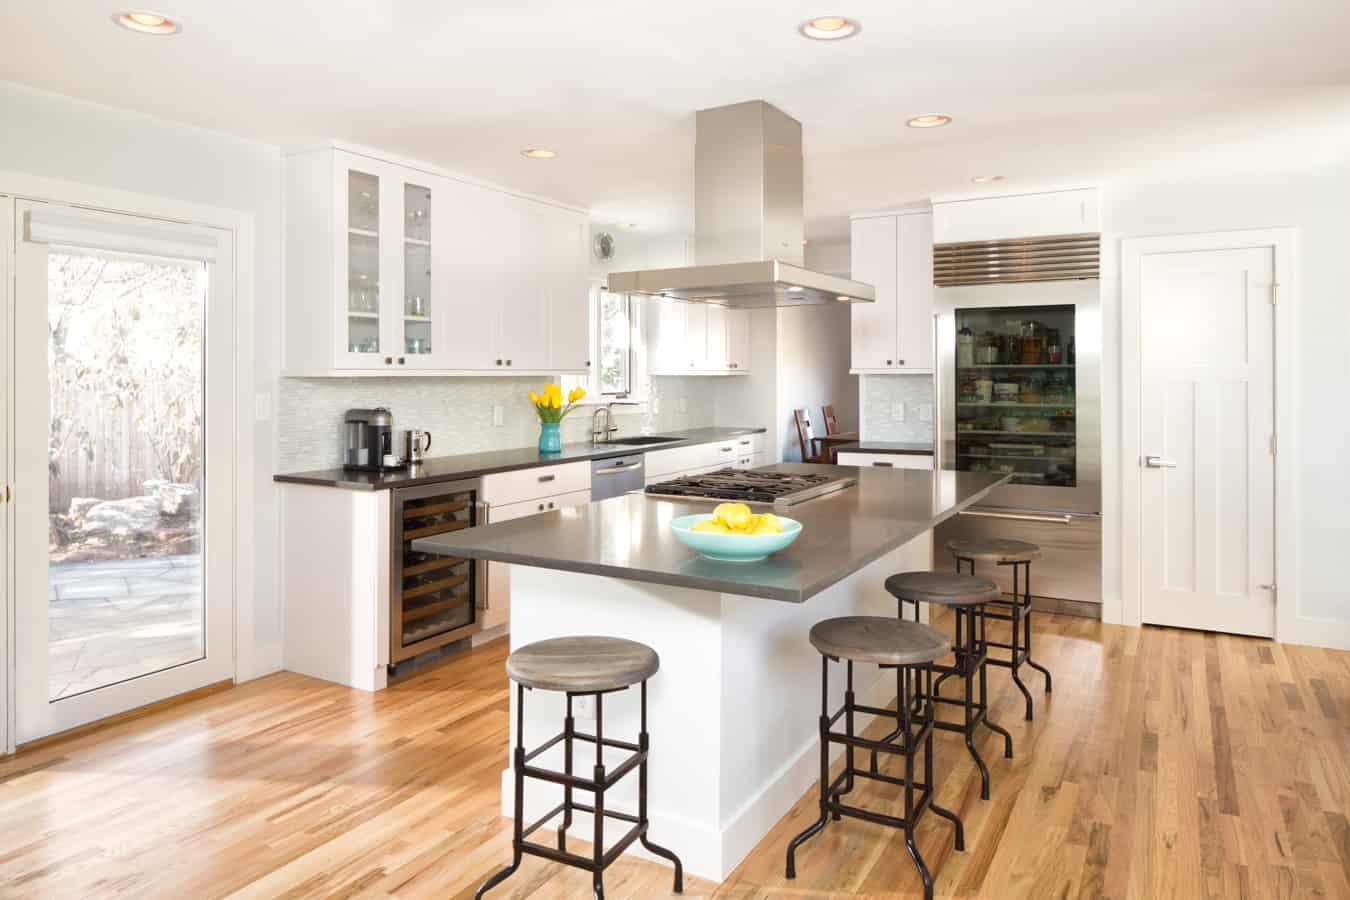 Melton Design Build- Kitchen Overall